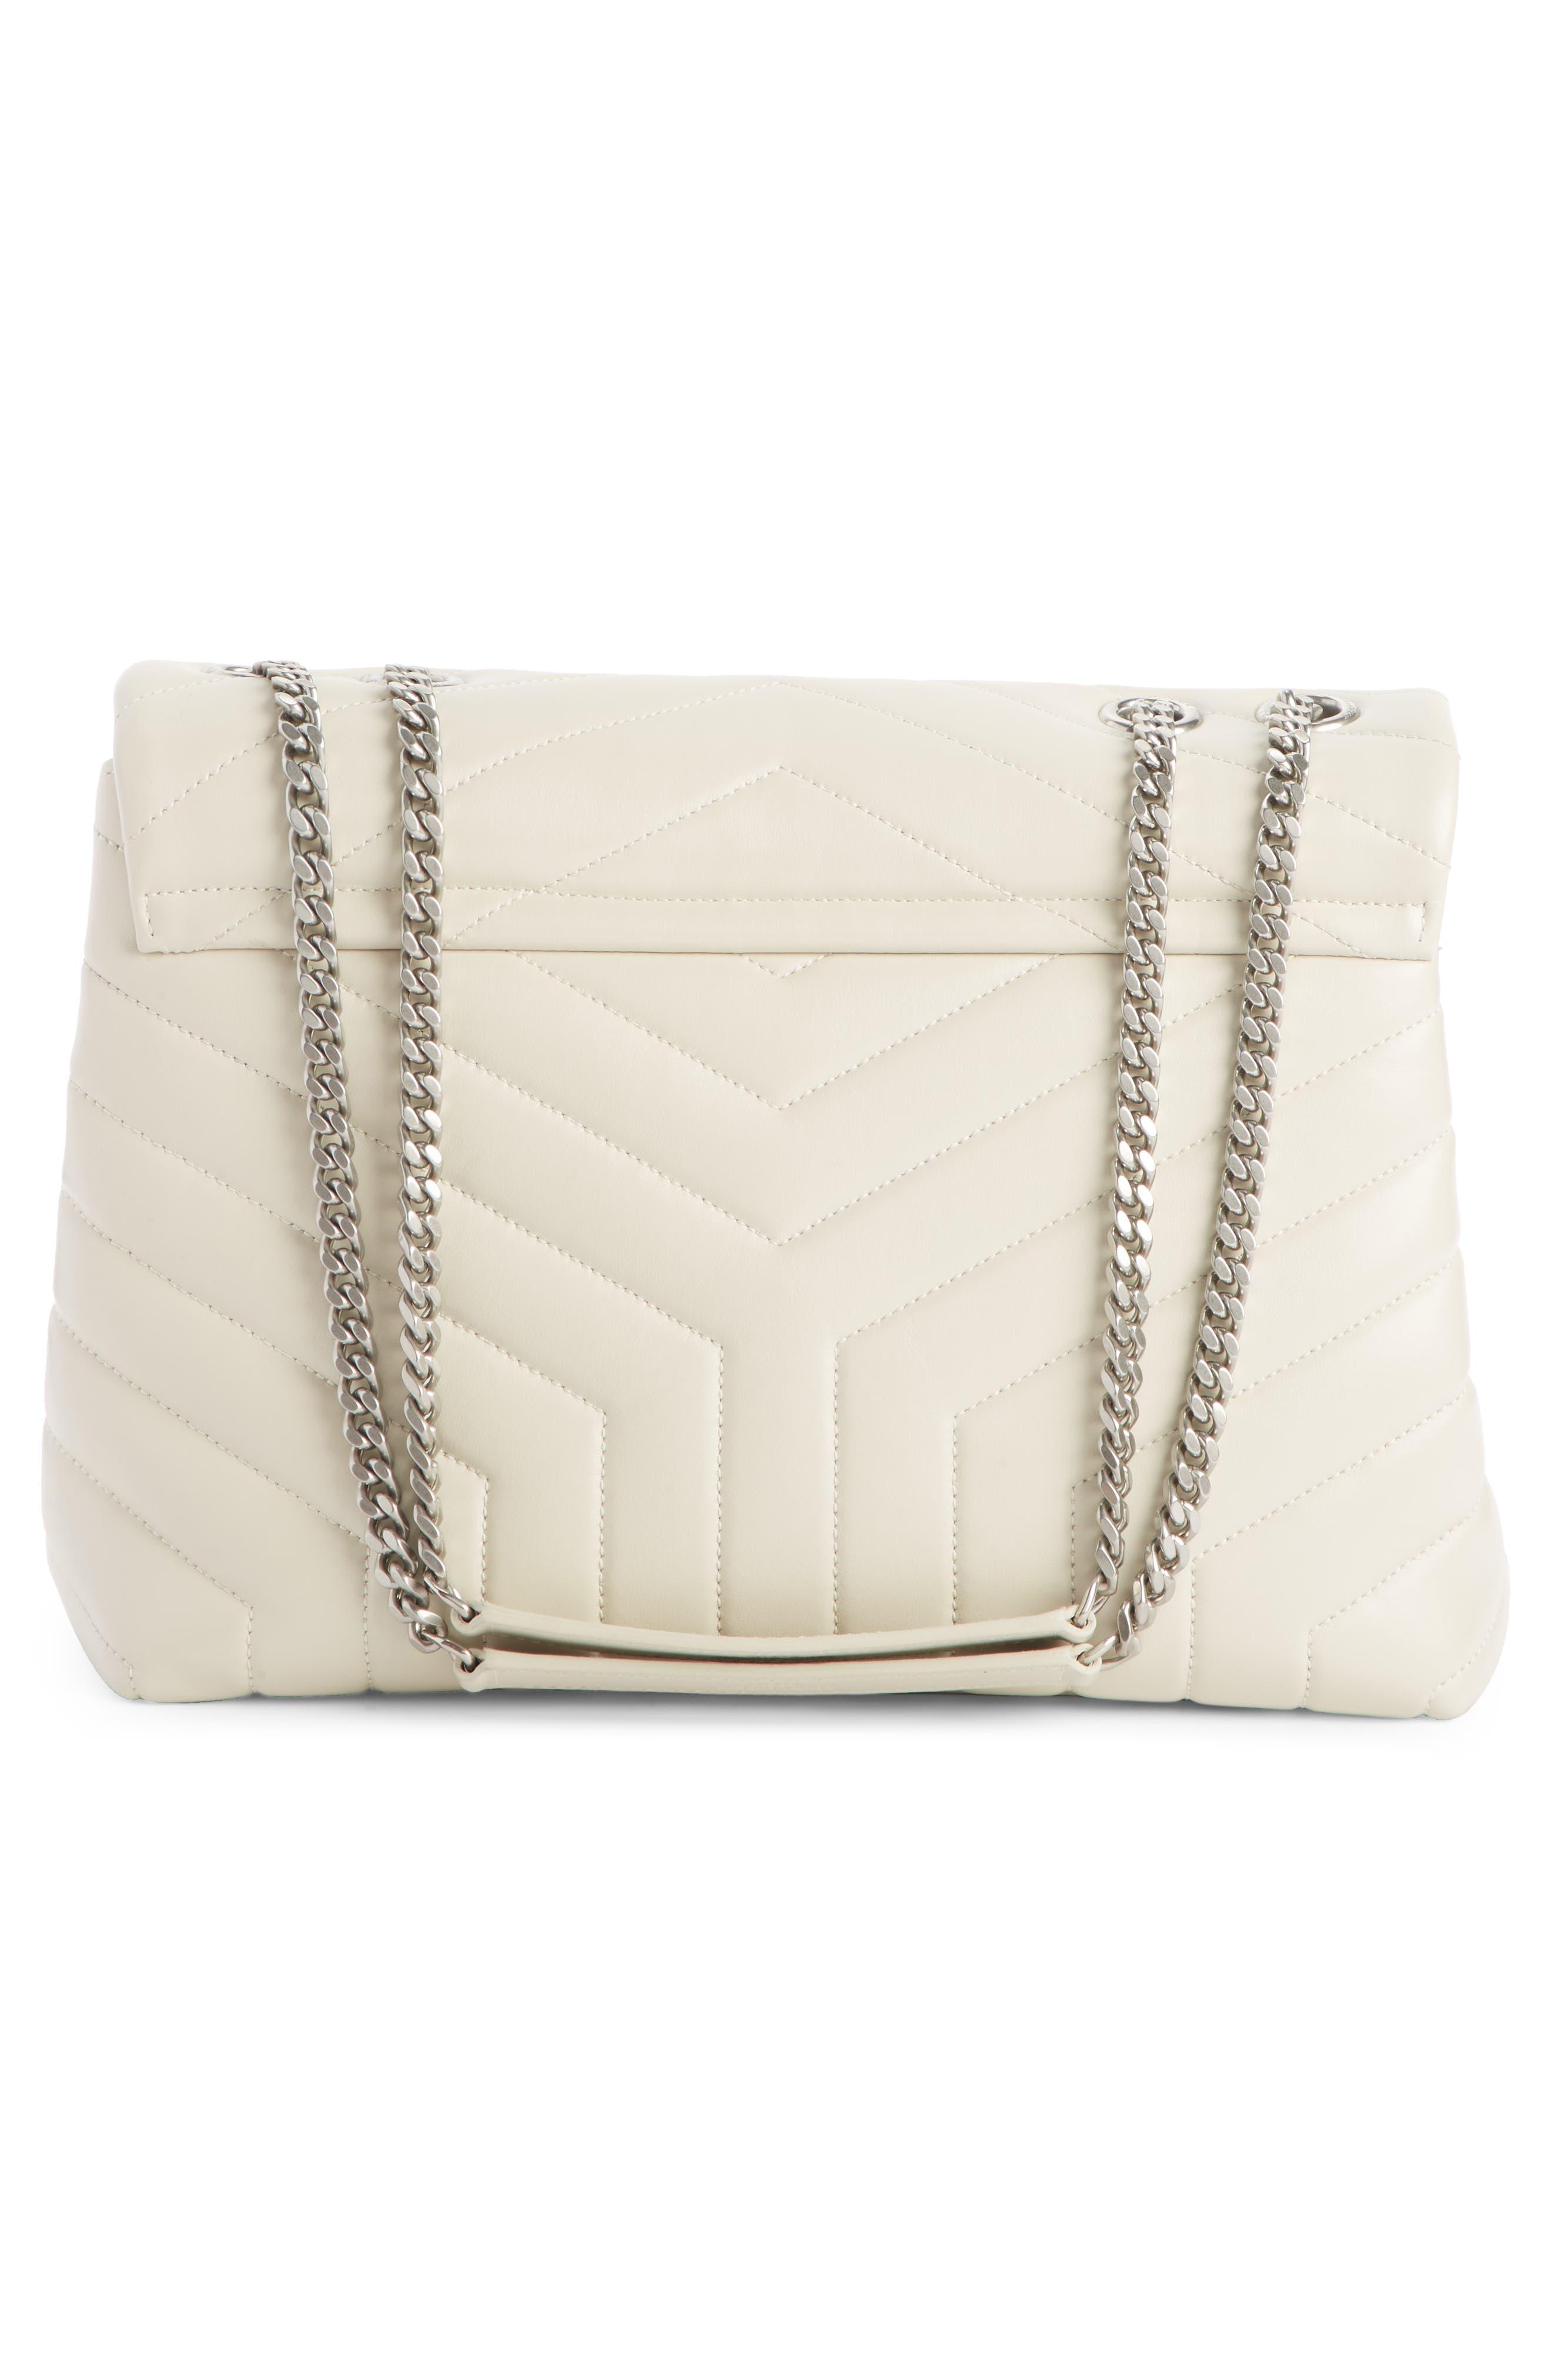 SAINT LAURENT, Medium Loulou Calfskin Leather Shoulder Bag, Alternate thumbnail 3, color, CREMA SOFT/ CREMA SOFT